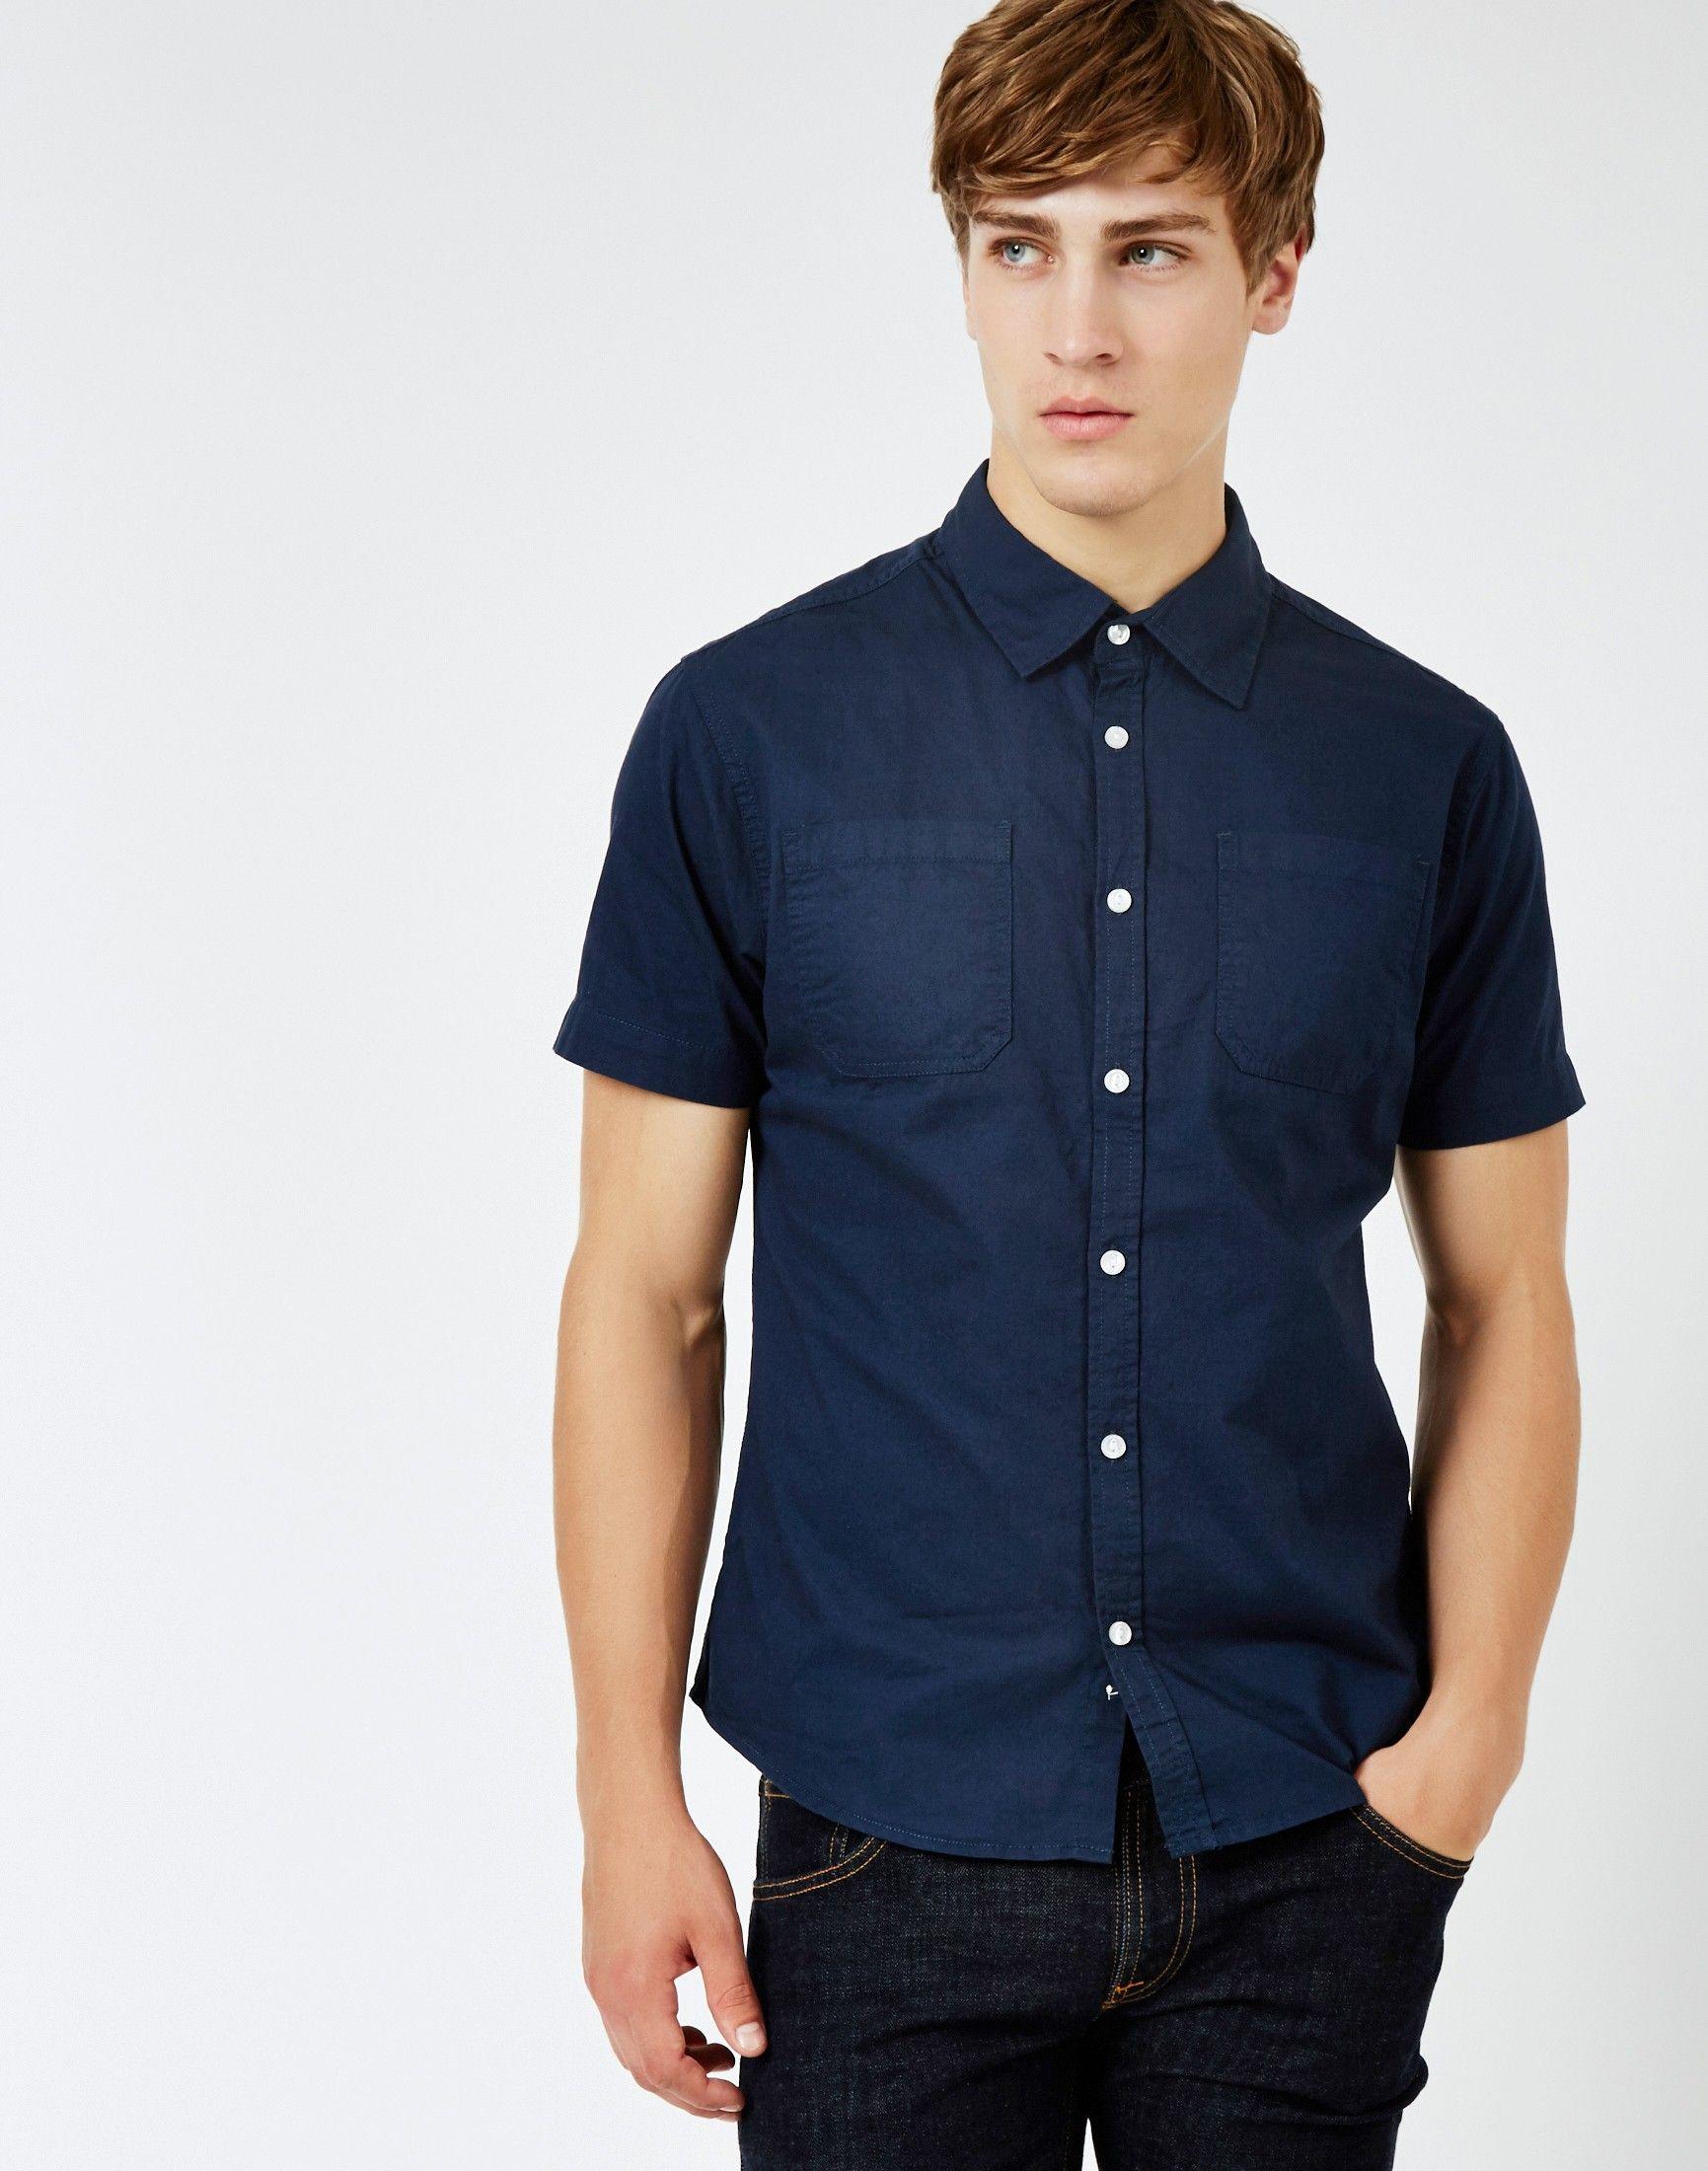 The Idle Man Twill Short Sleeve Shirt Navy | Shop men's smart ...